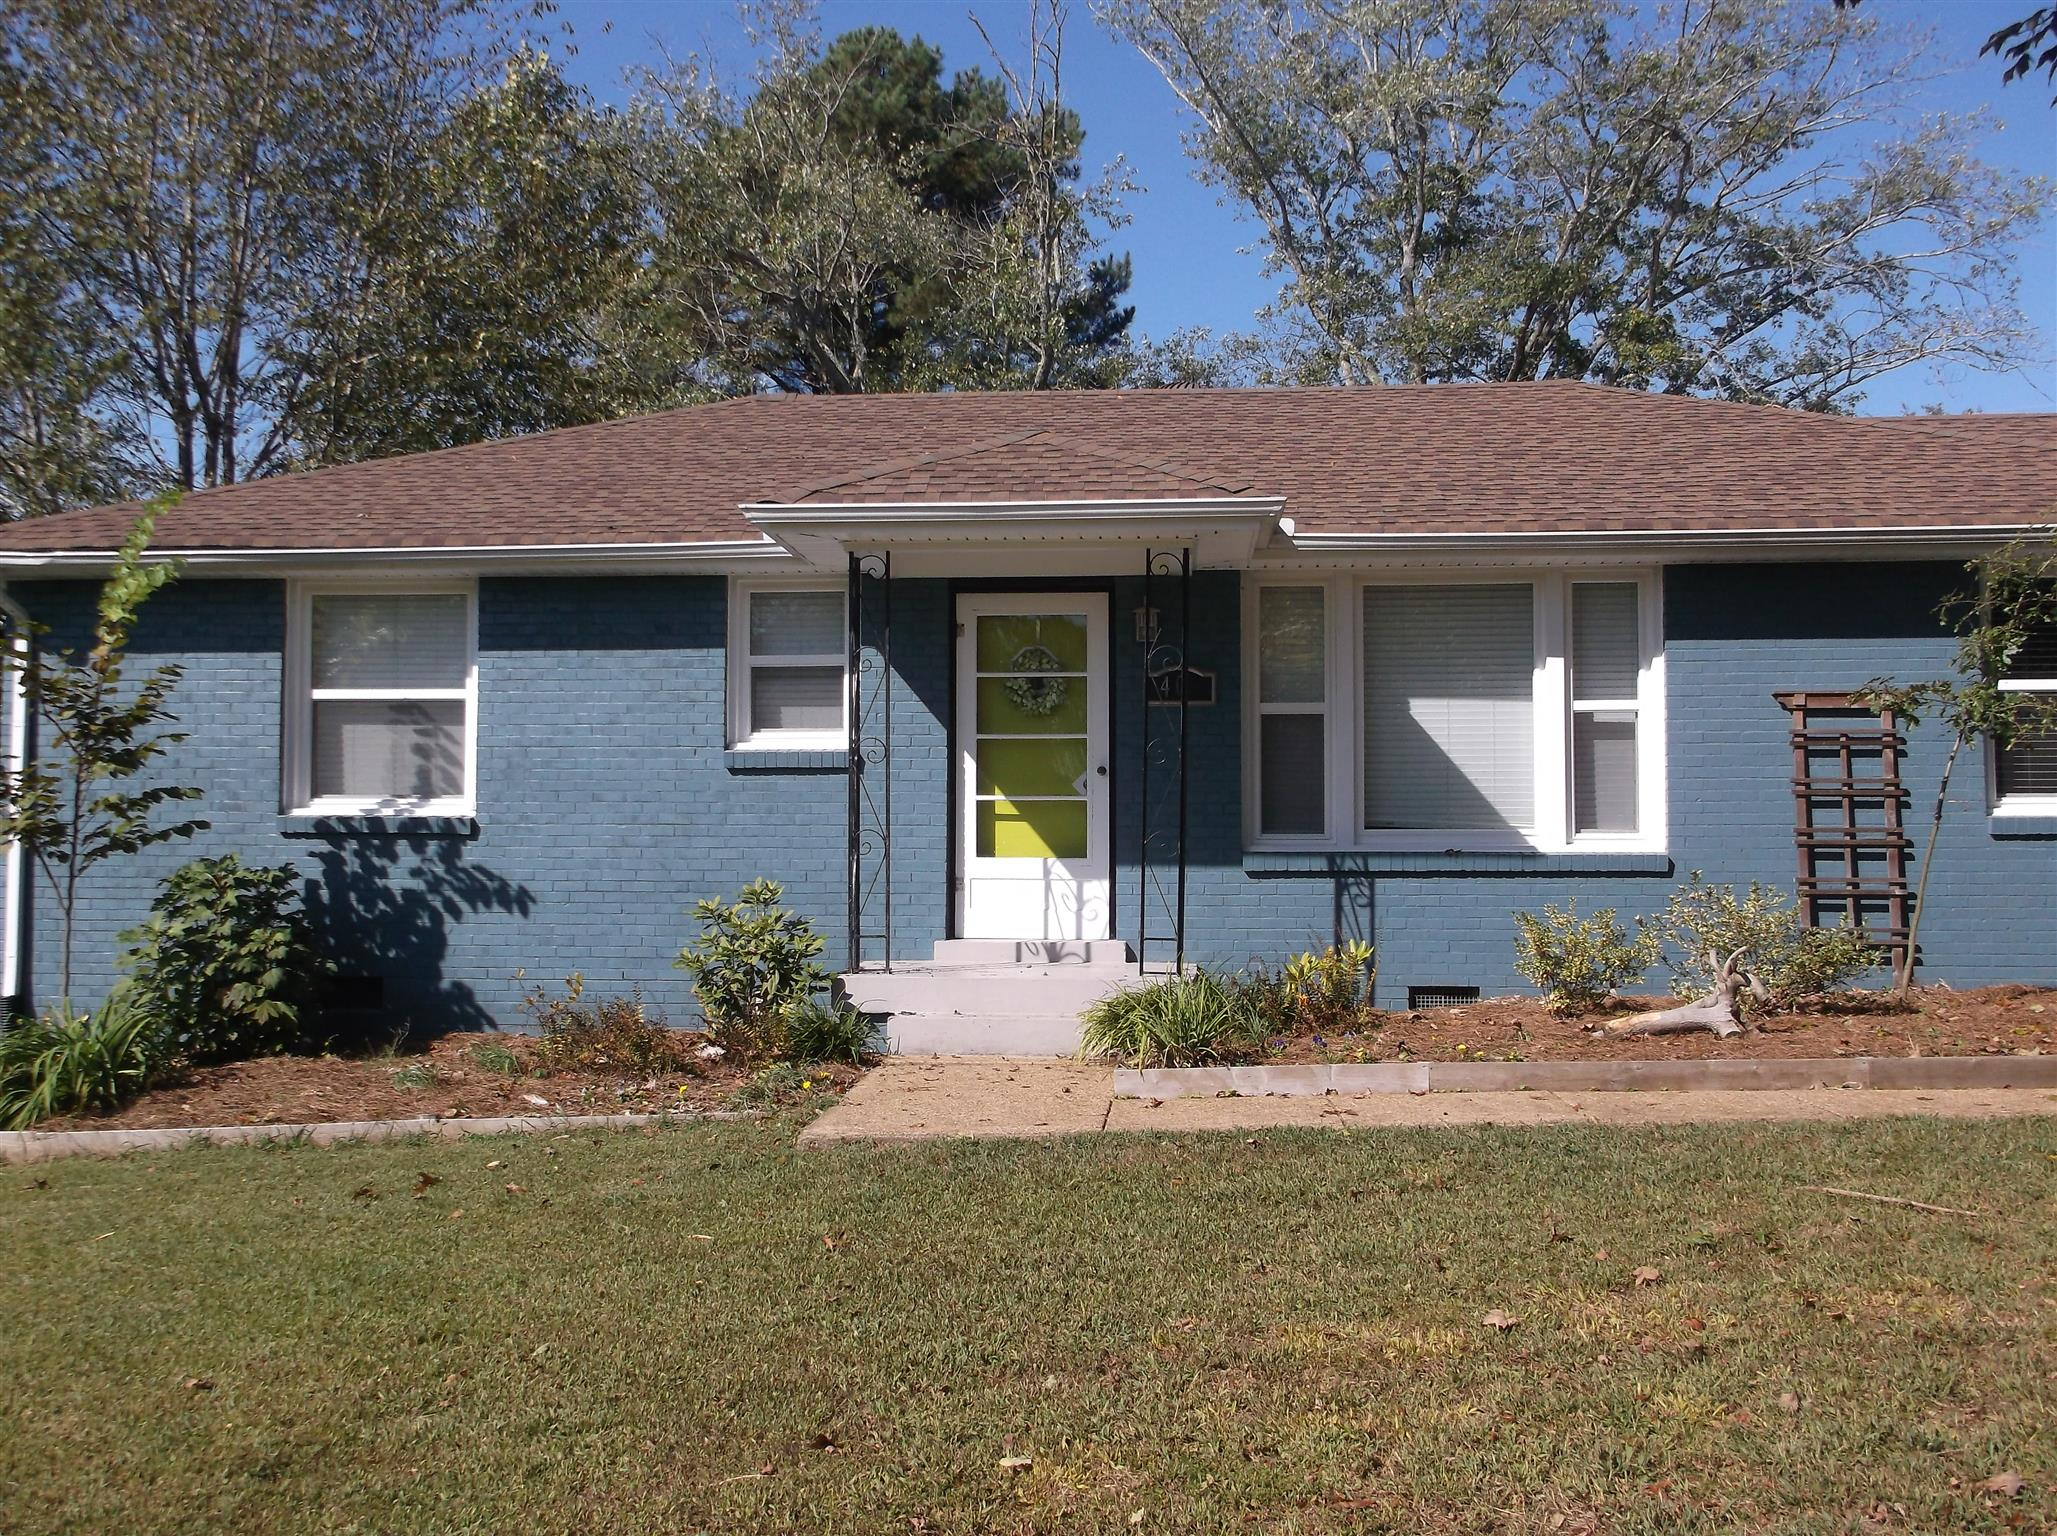 404 E Coy Cir, Clarksville, TN 37043 - Clarksville, TN real estate listing